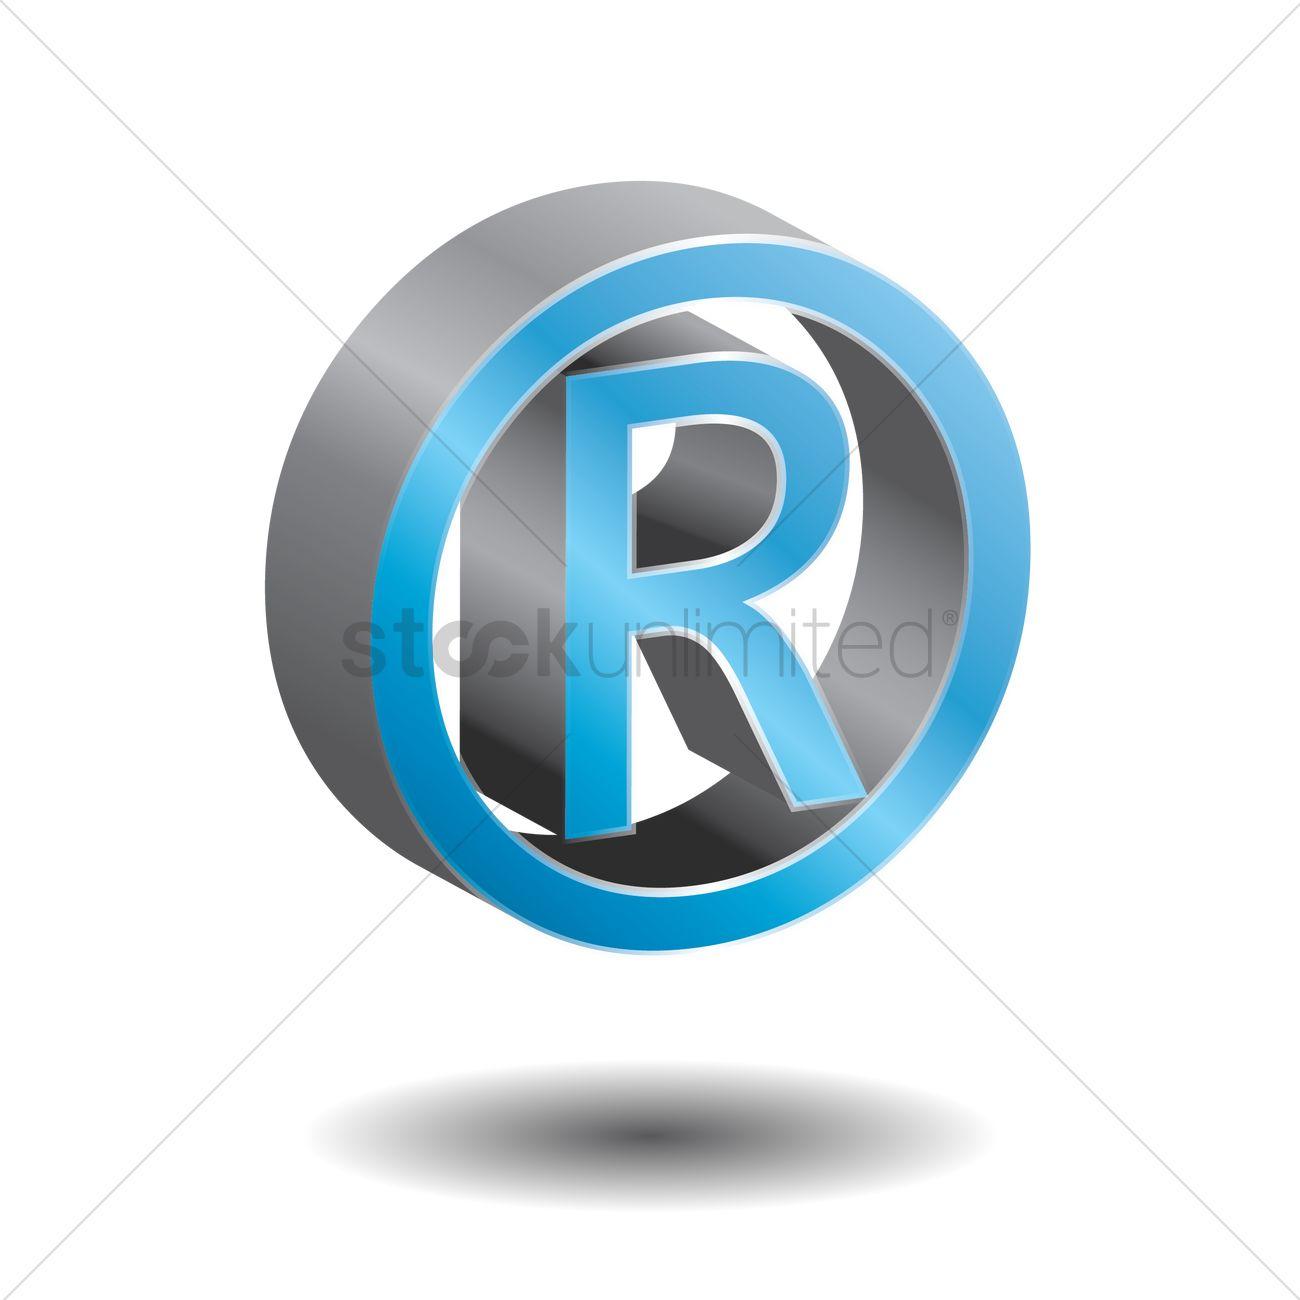 Registered trademark symbol vector image 1821502 stockunlimited registered trademark symbol vector graphic biocorpaavc Gallery